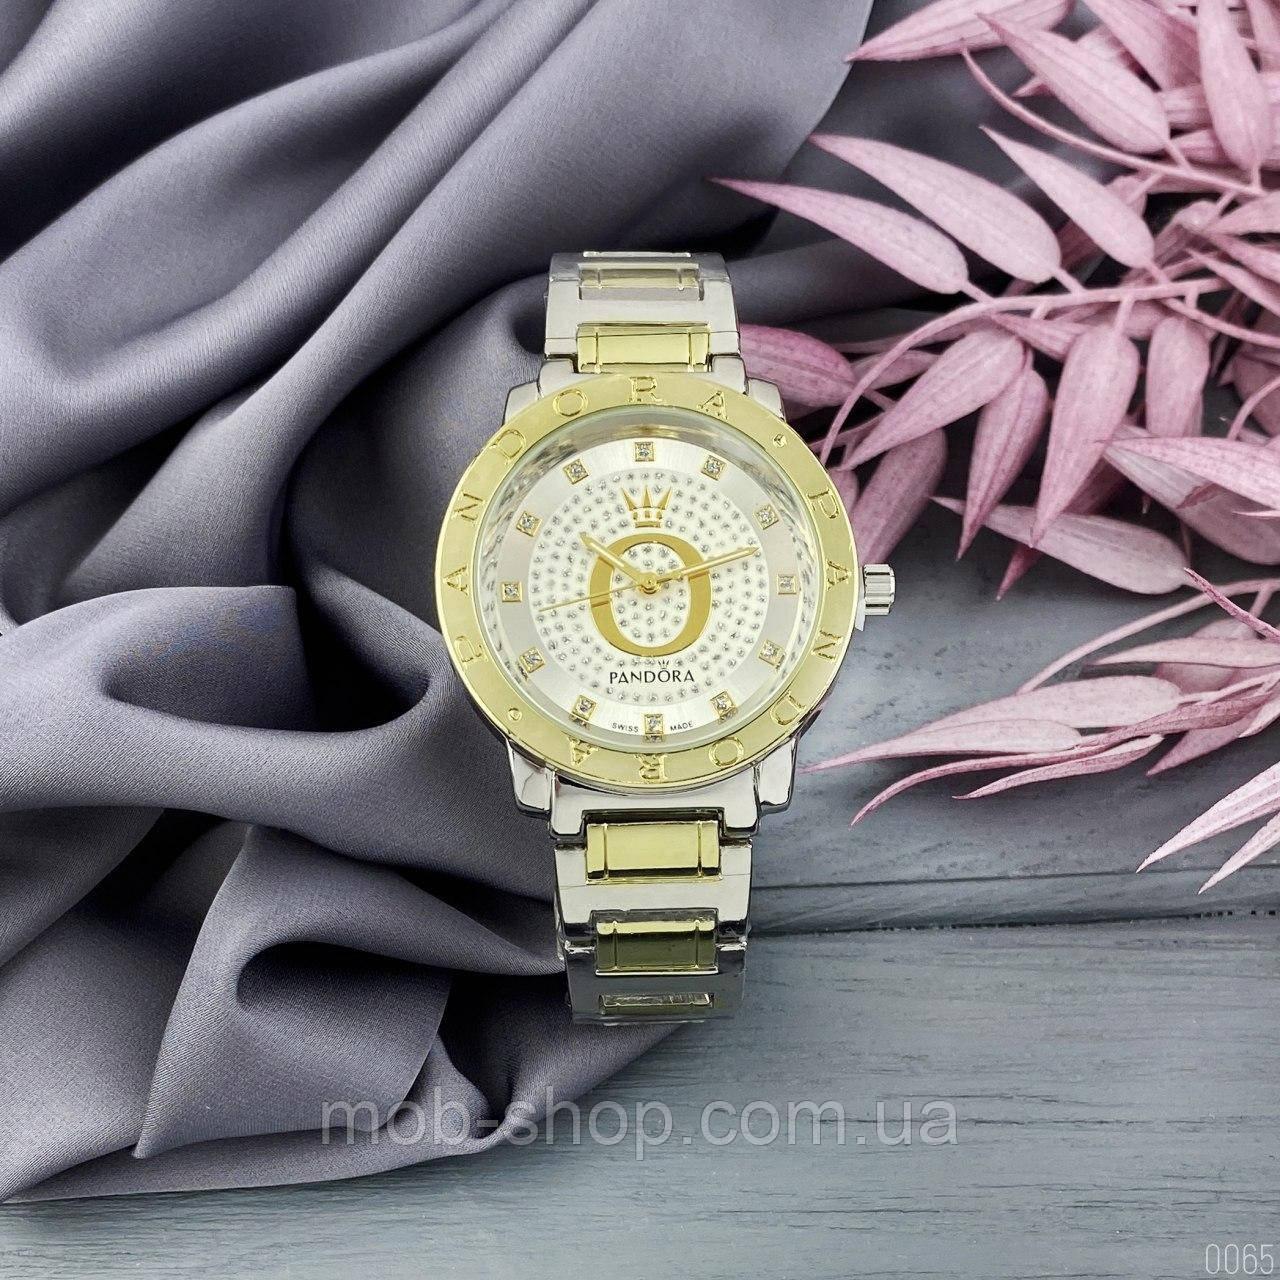 Женские наручные часы Pandora 6301 Z Diamonds Silver-Gold-Silver